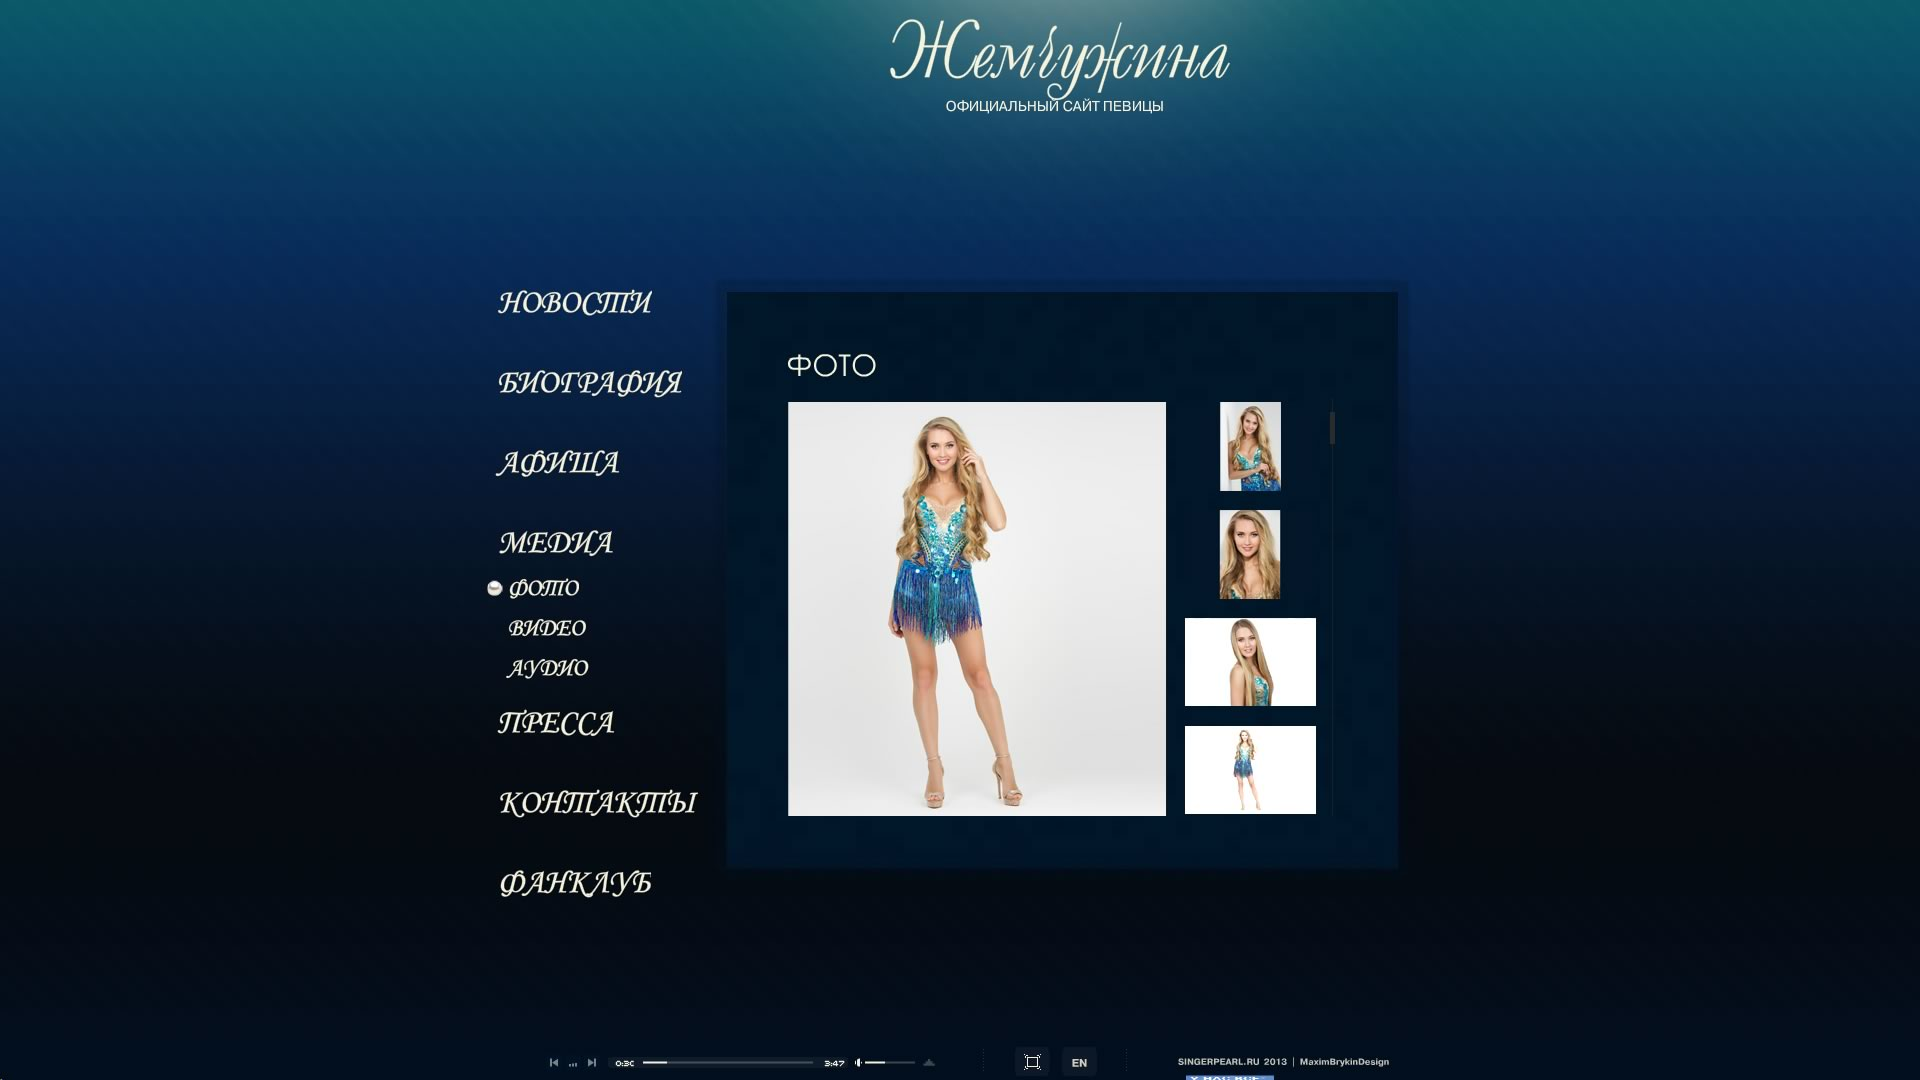 Создание сайта singerpearl.ru (flash) (6)